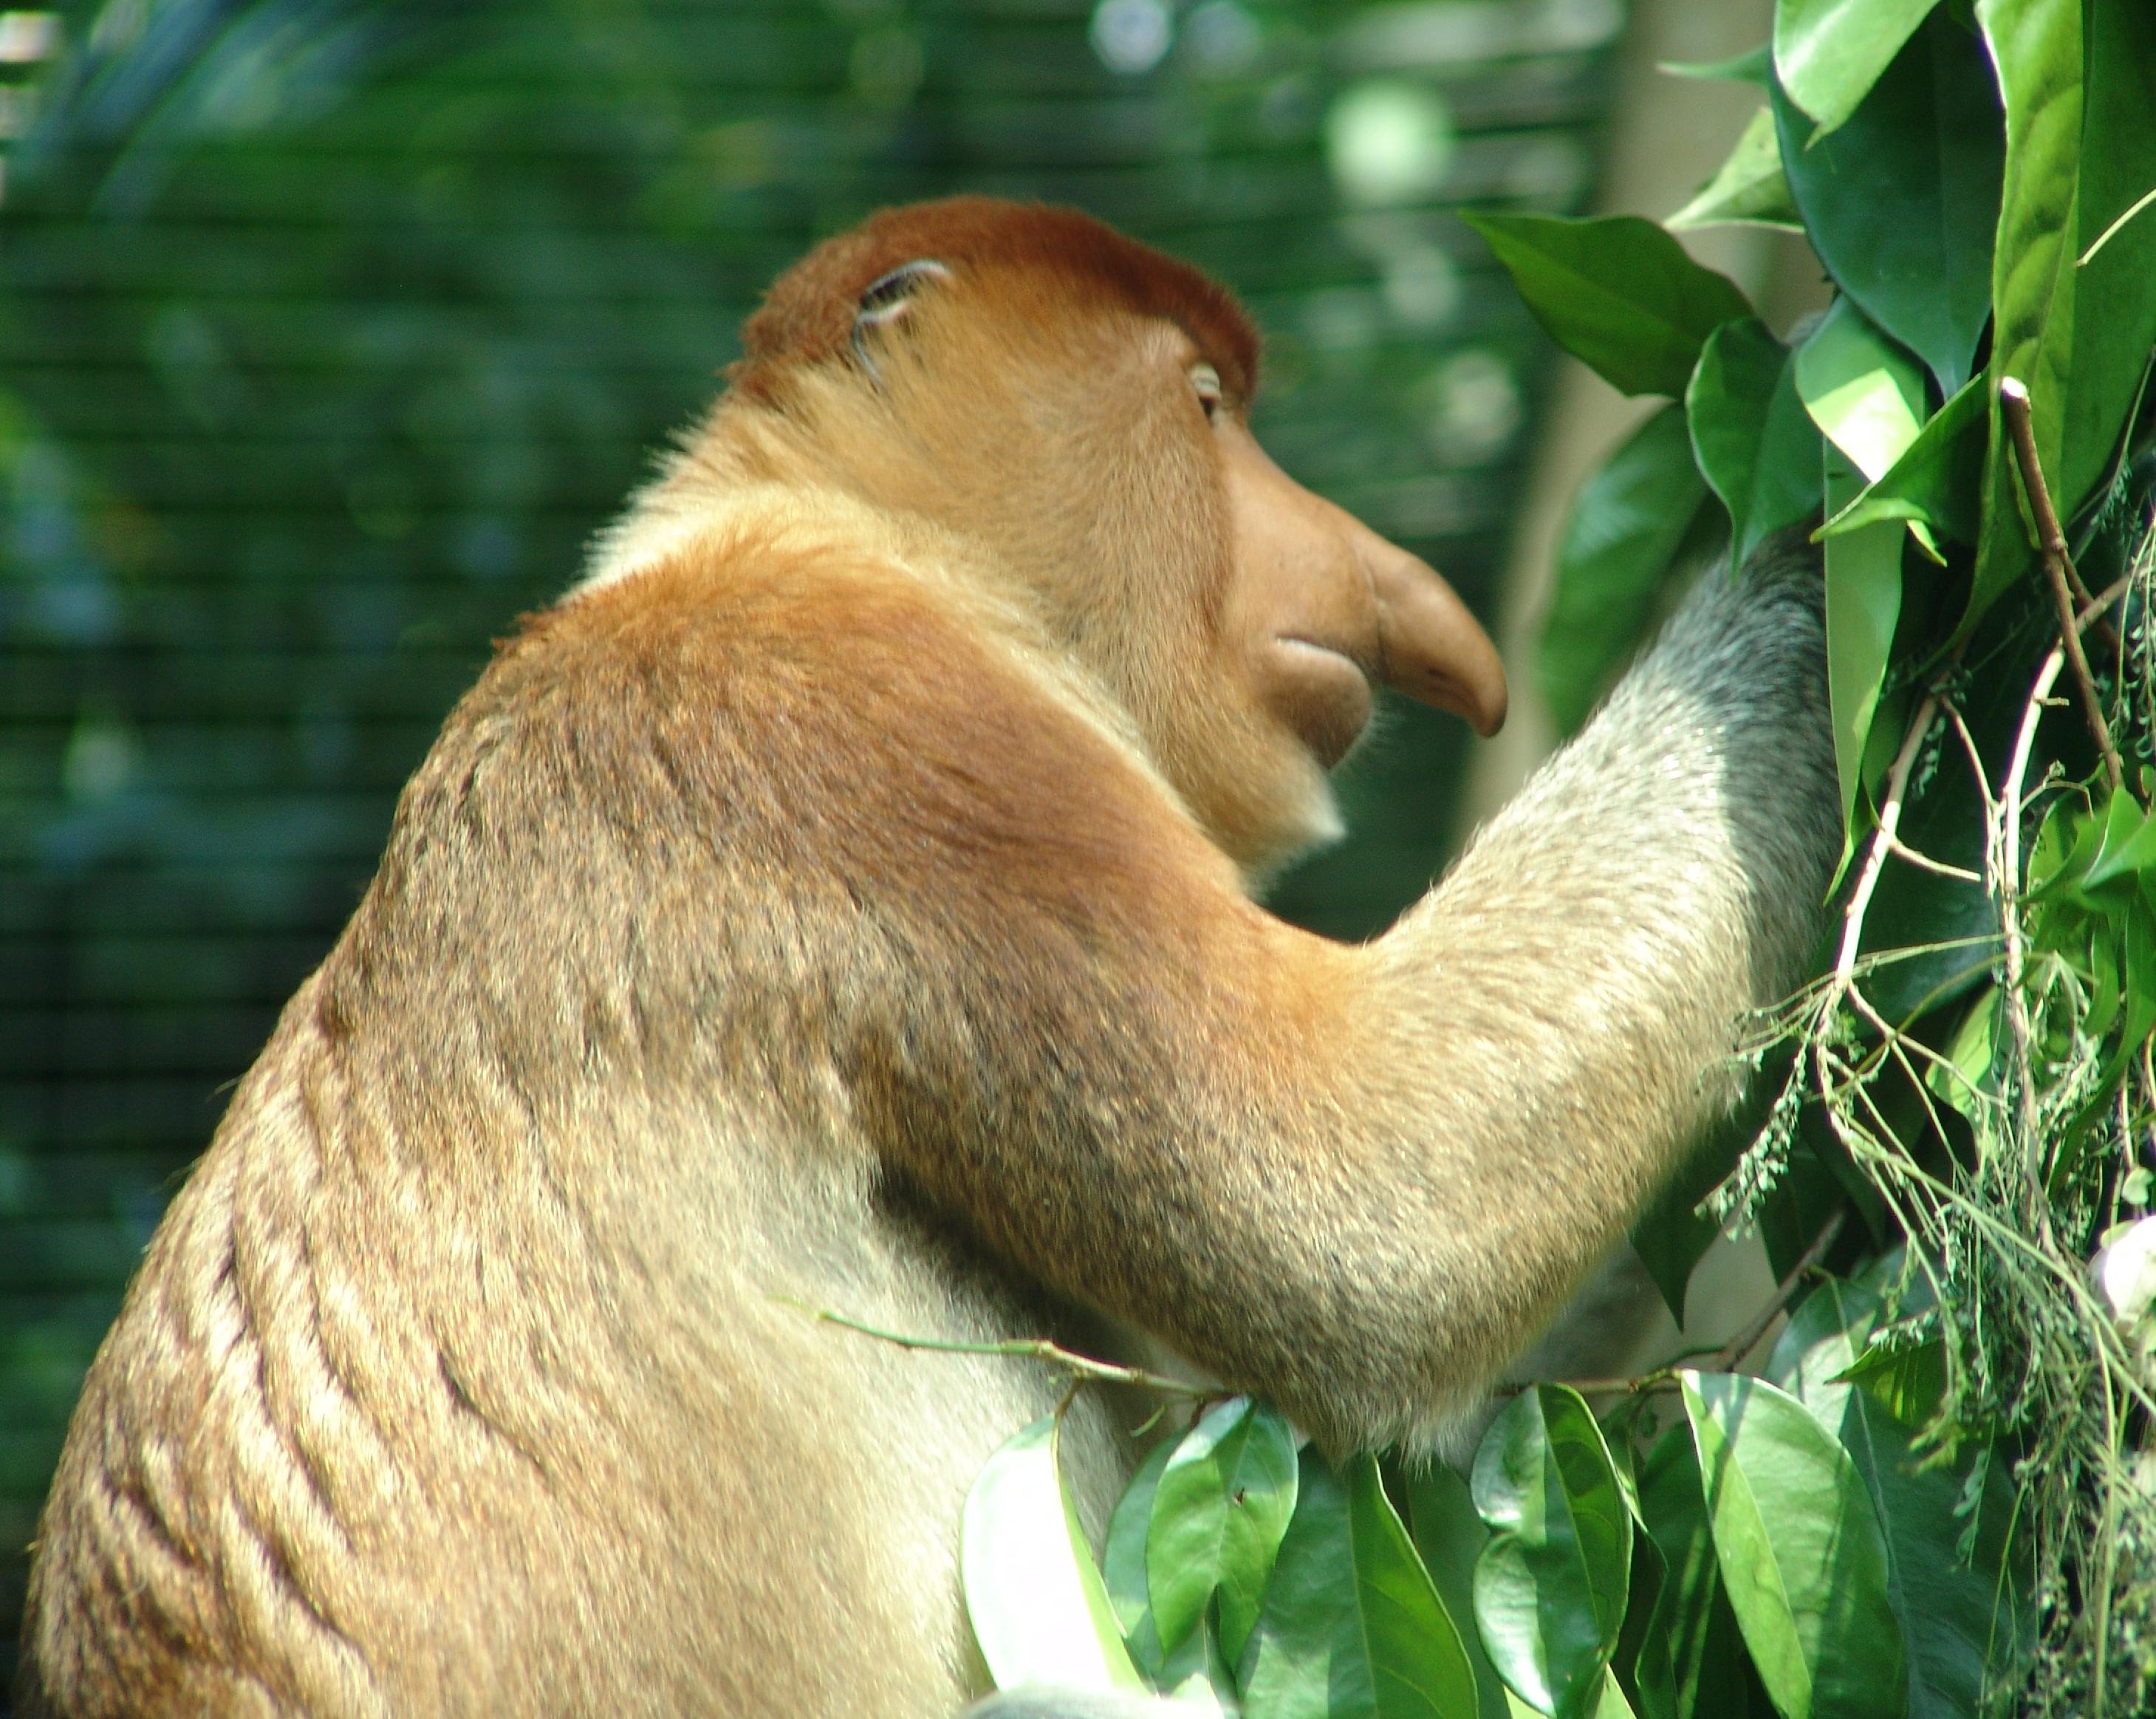 MiniMonos Paradise: New Looks on Monkey Fact Monday!